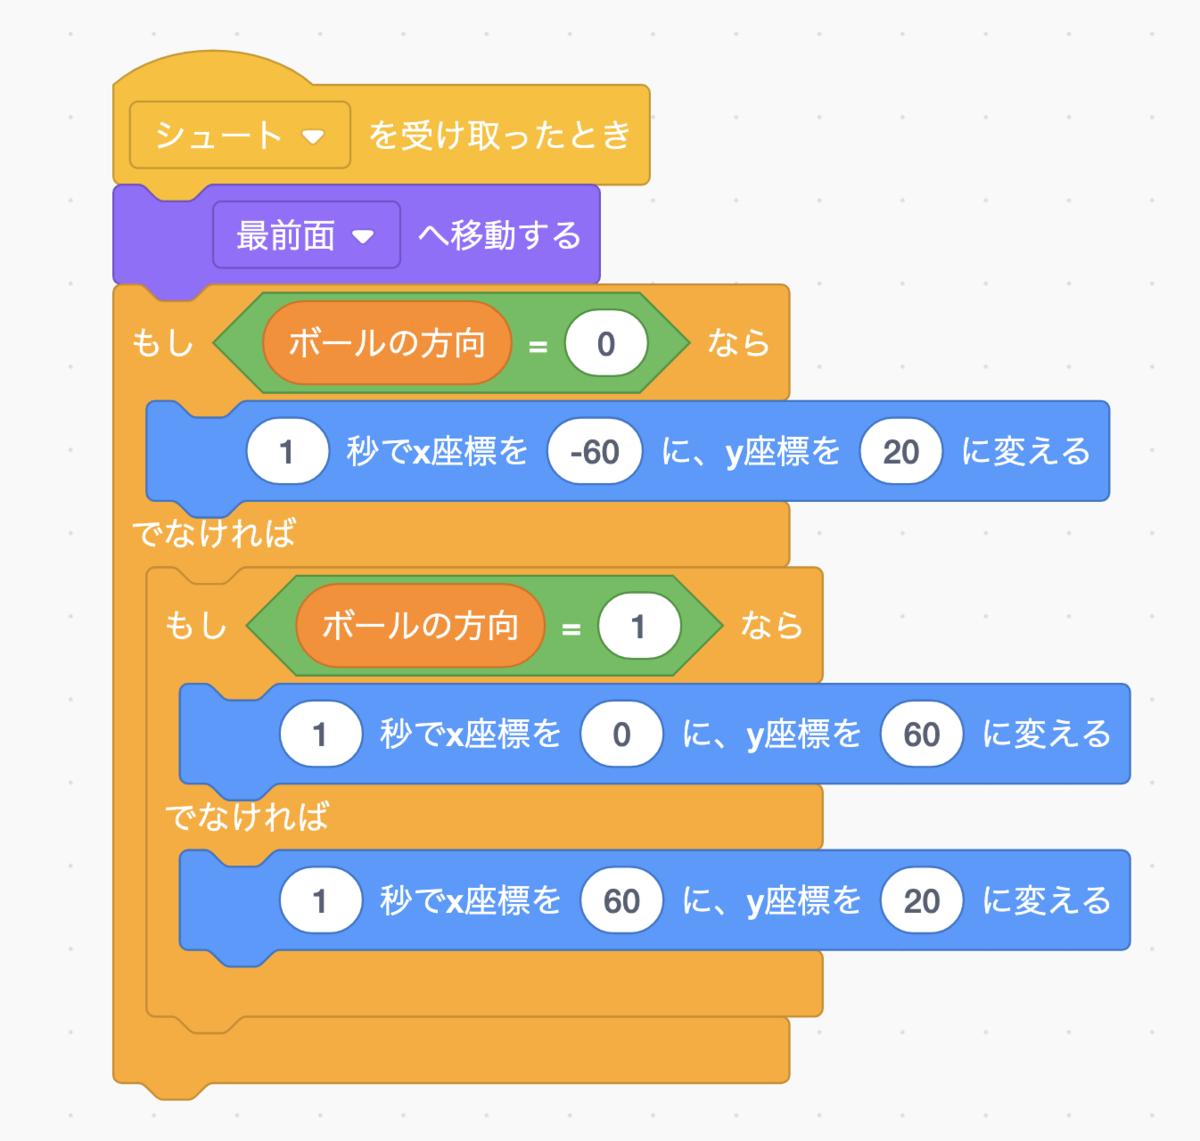 f:id:papa-sensei:20200302105036p:plain